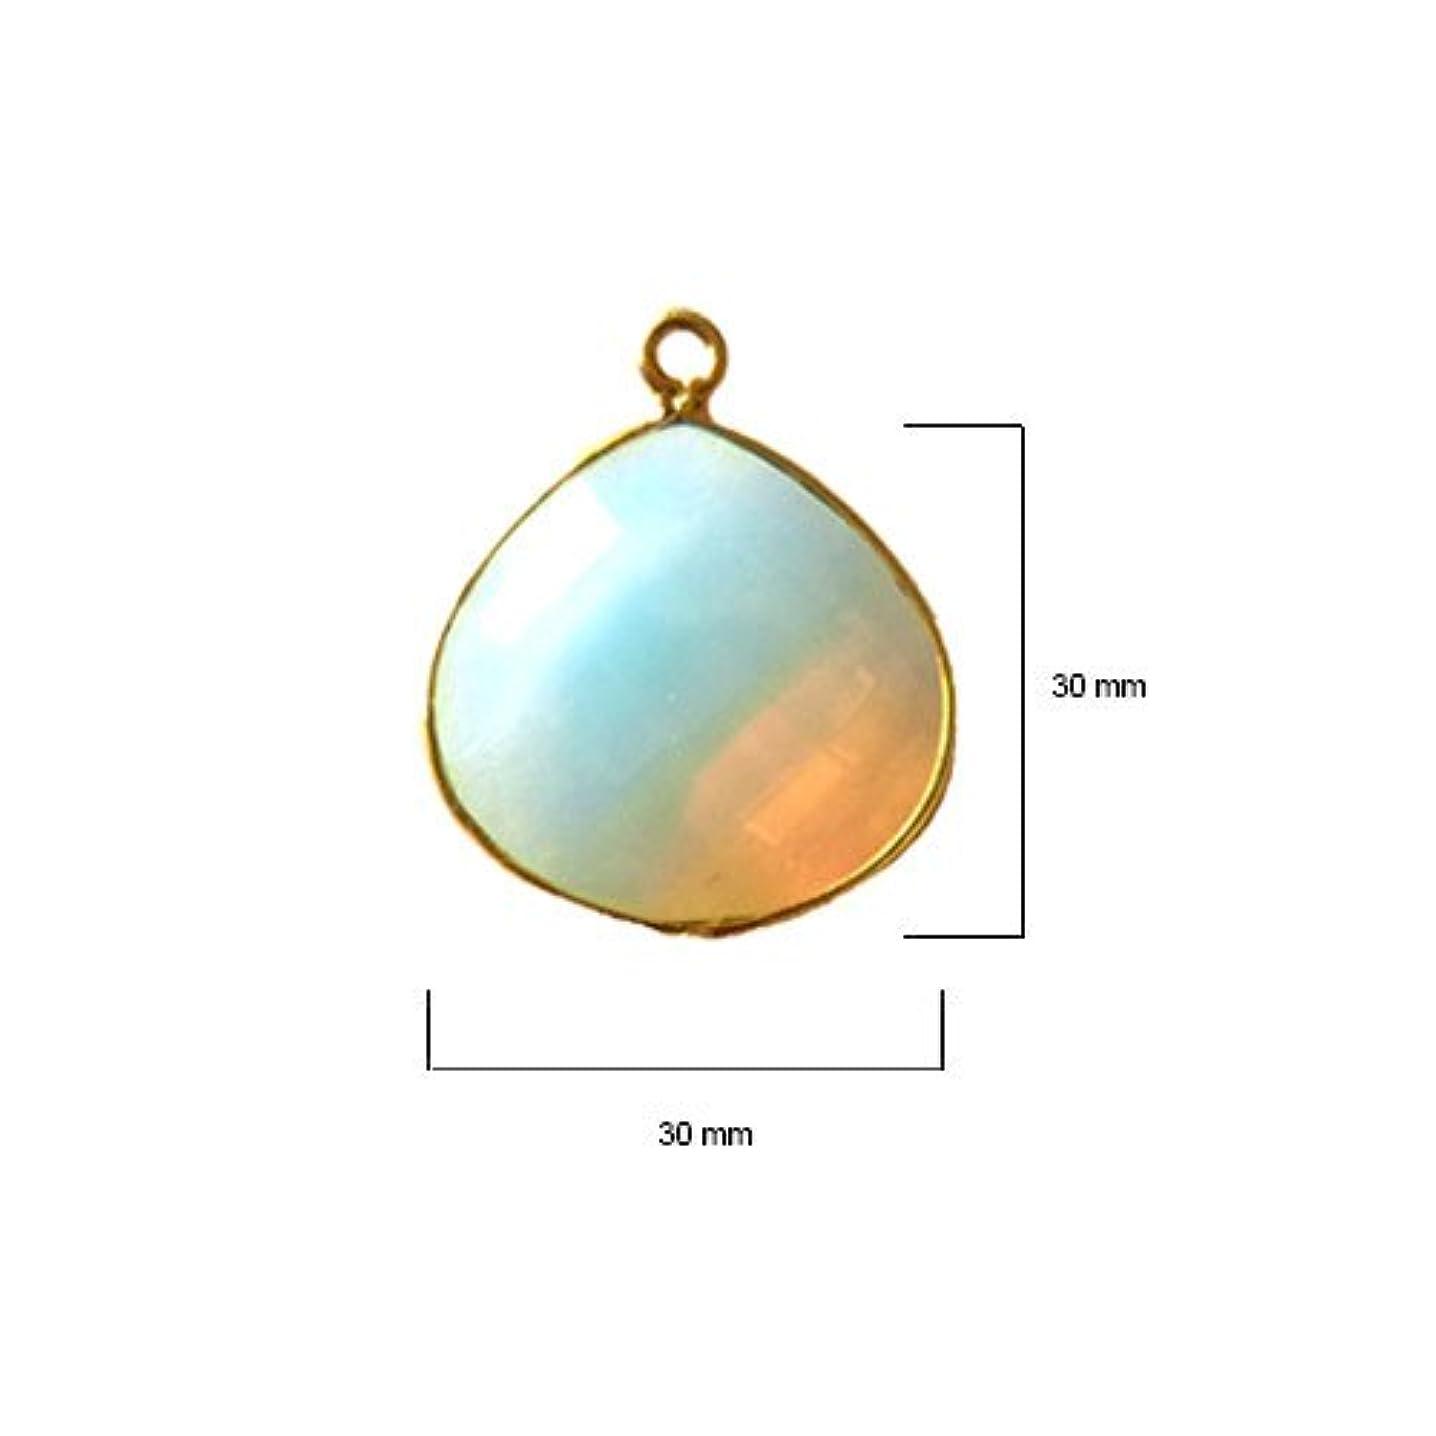 2 Pcs Opalite Heart Beads 30mm 24K Gold Vermeil by BESTINBEADS, Opalite Hydro Quartz Heart Pendant Bezel Gemstone Connectors Over 925 Sterling Silver Bezel Jewelry Making Supplies